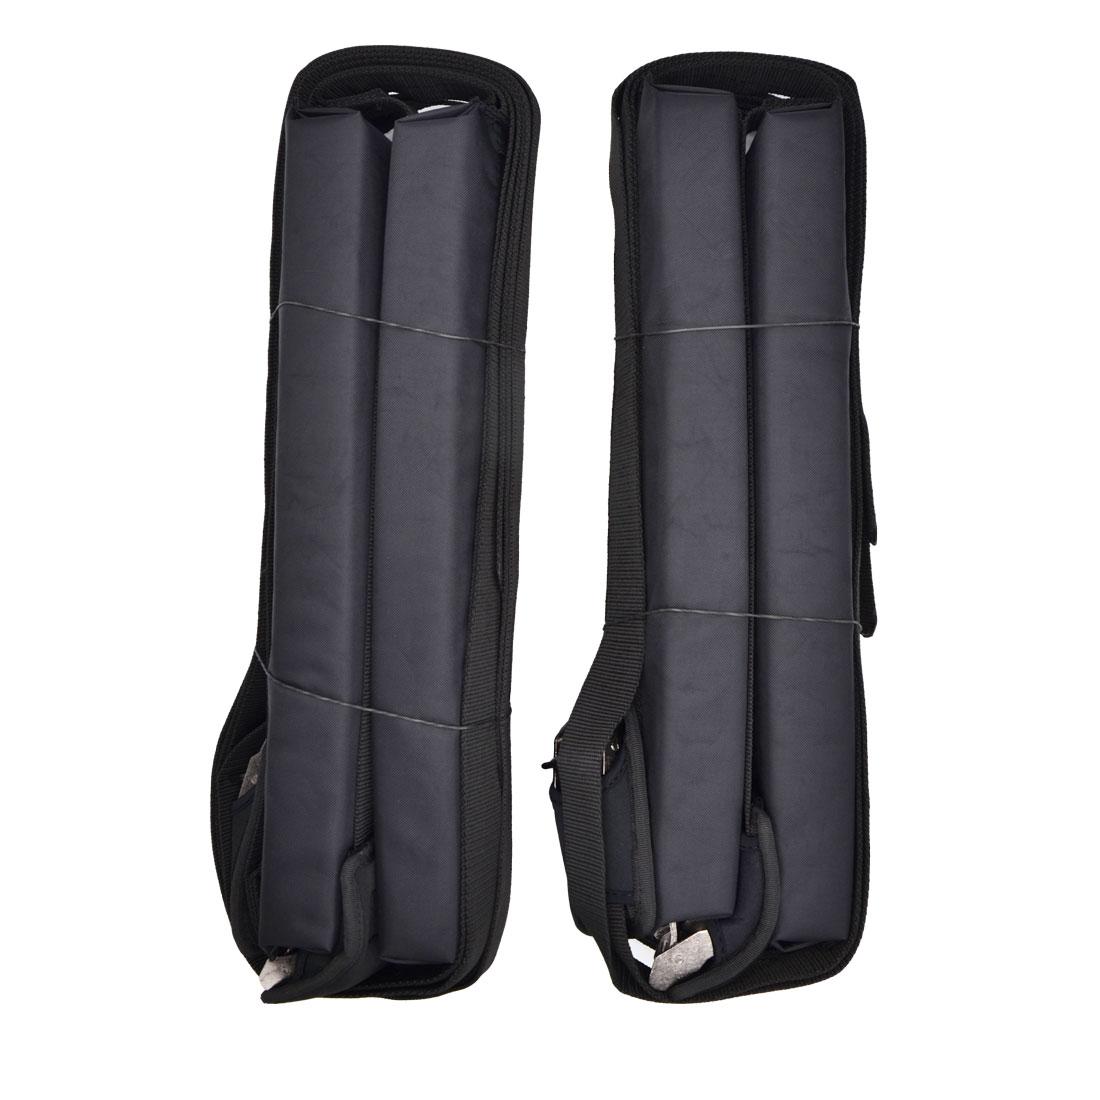 Doppel Surfboard Auto Transportgurten für 2-6 Boards Car surfboard soft rack